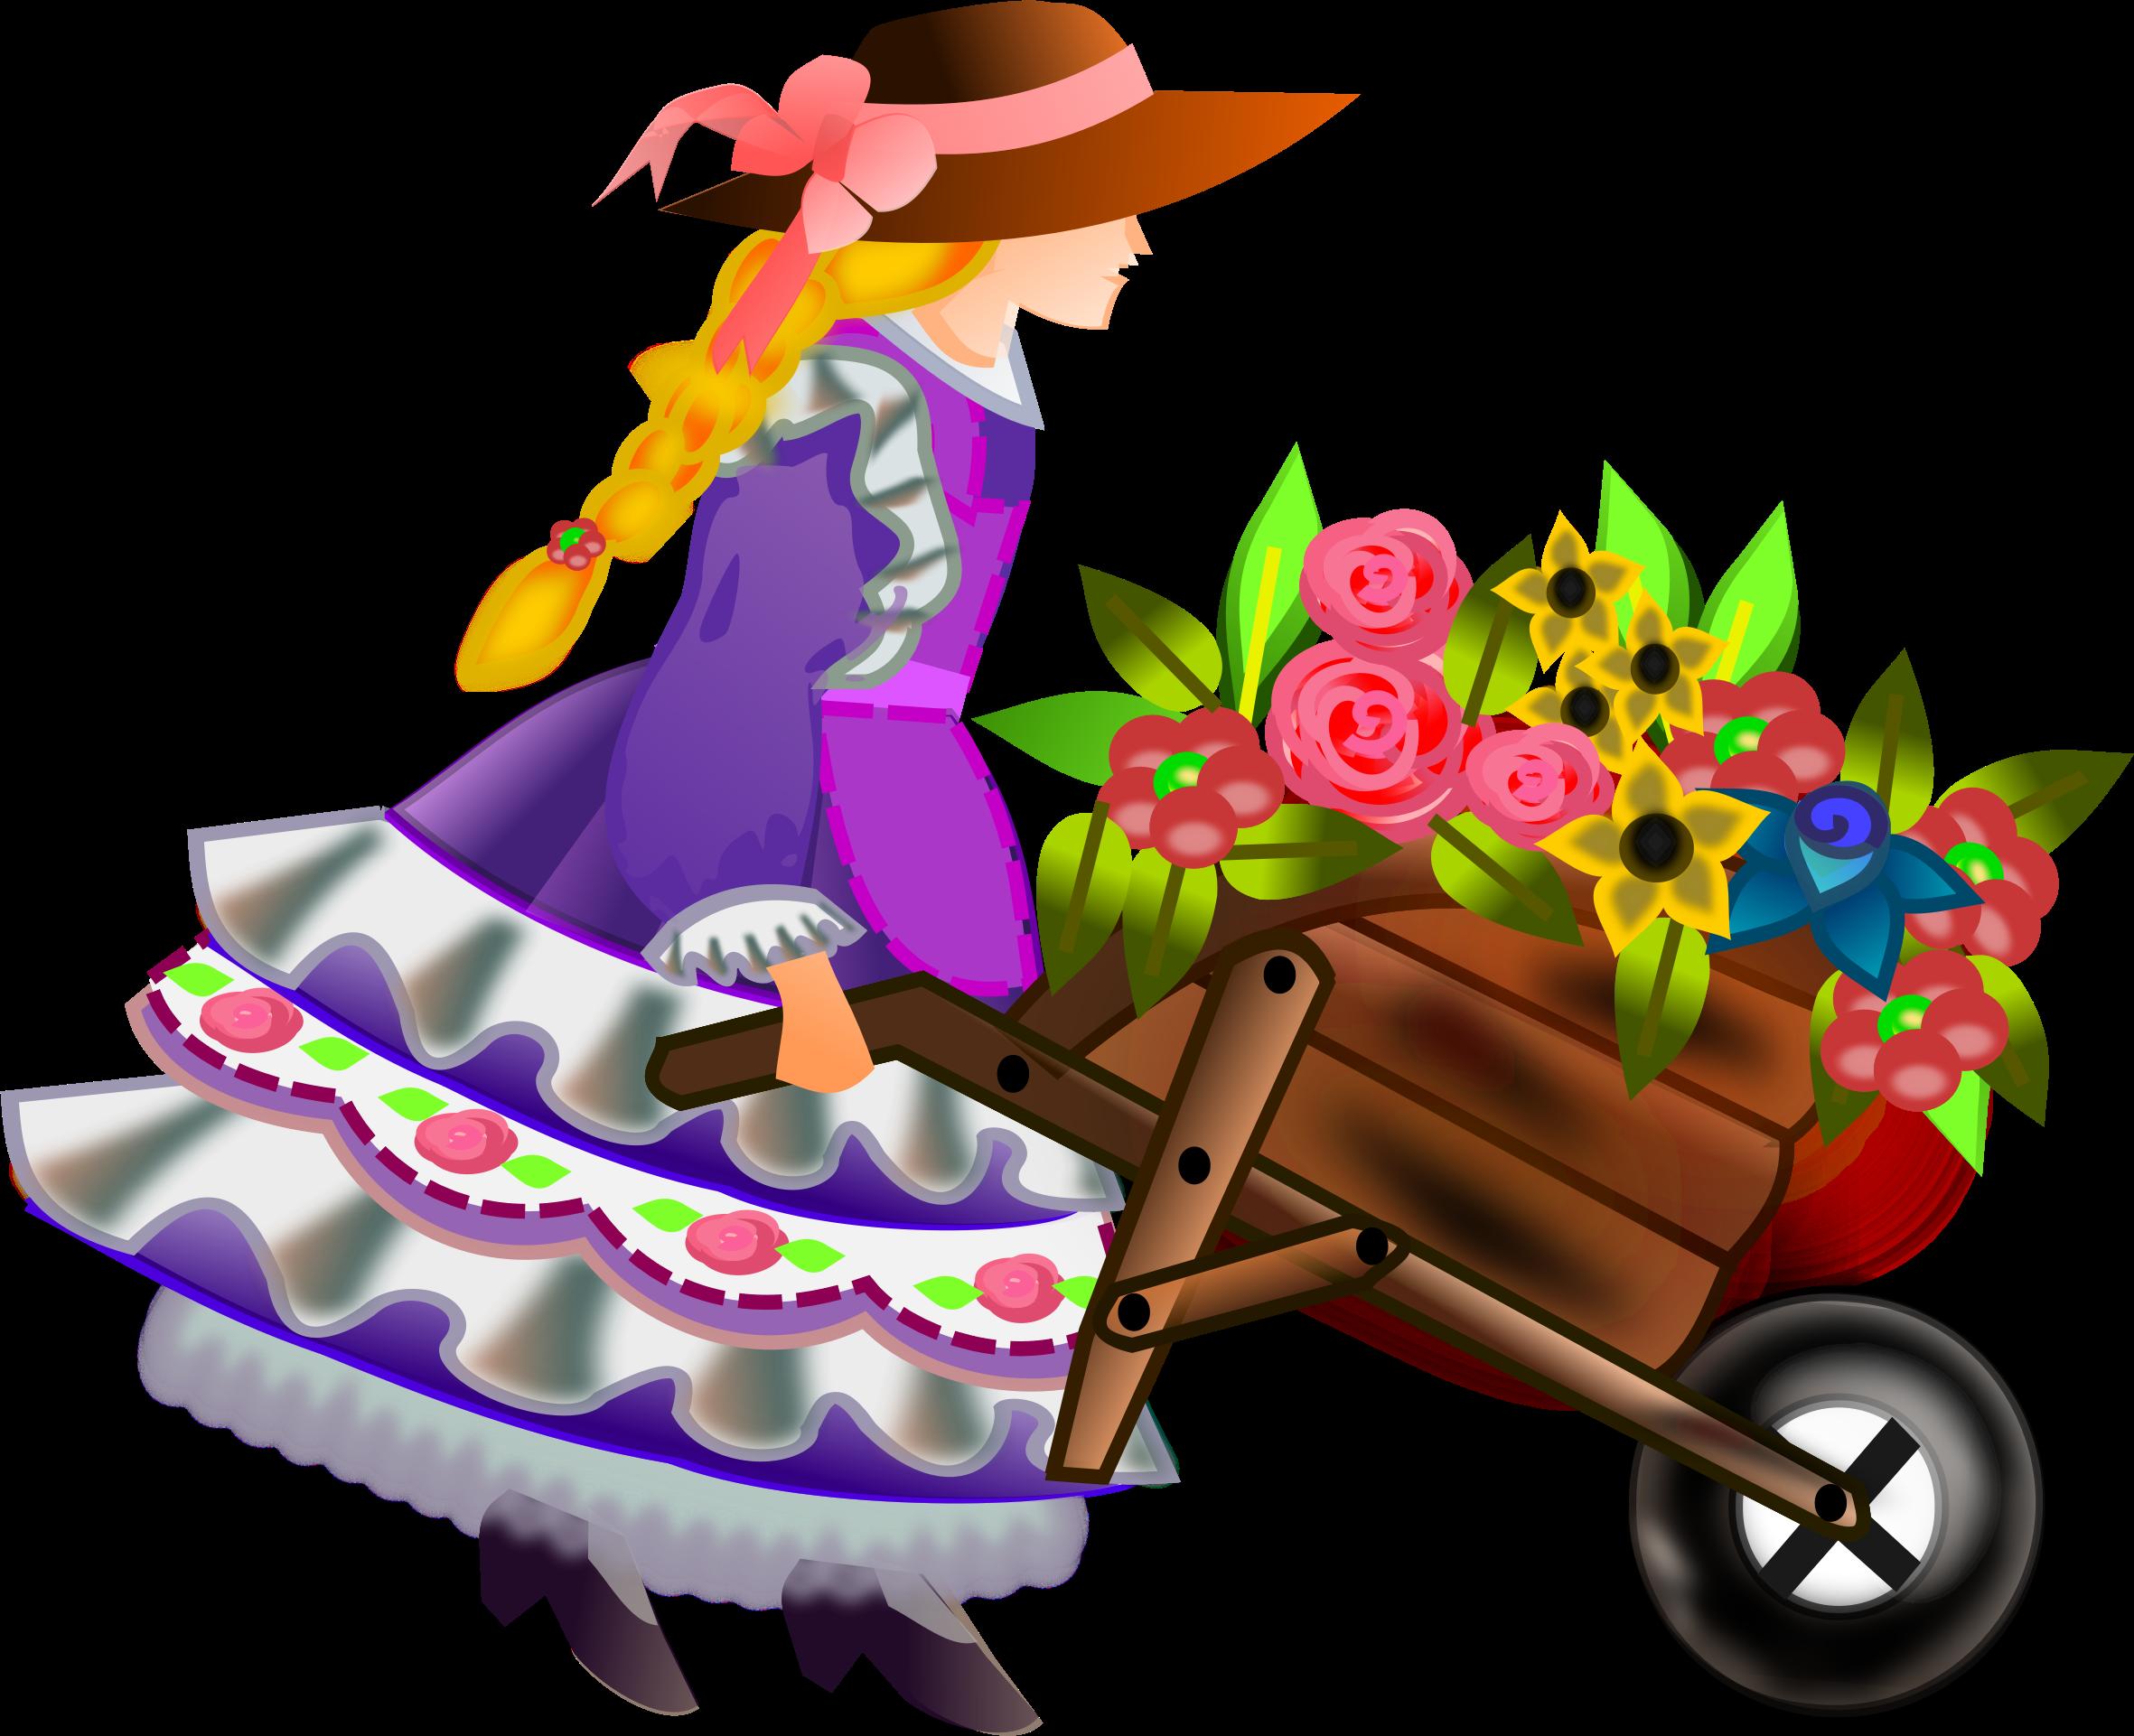 wheelbarrow with flowers by @gurica, A girl pushes a.